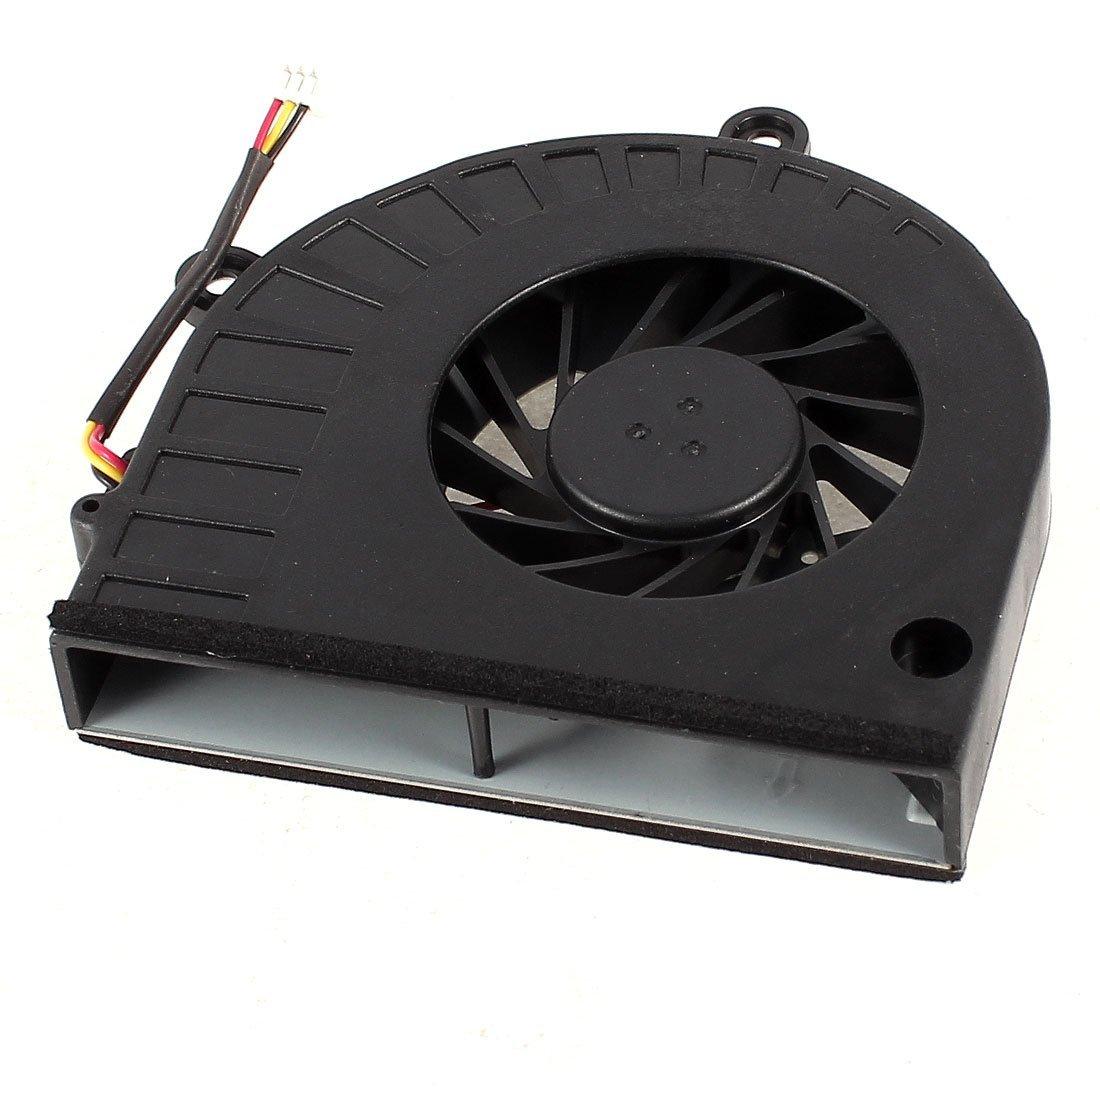 Aluminium-Laptop CPU-Lüfter MF60120V1-B100-G99: Amazon.de: Elektronik